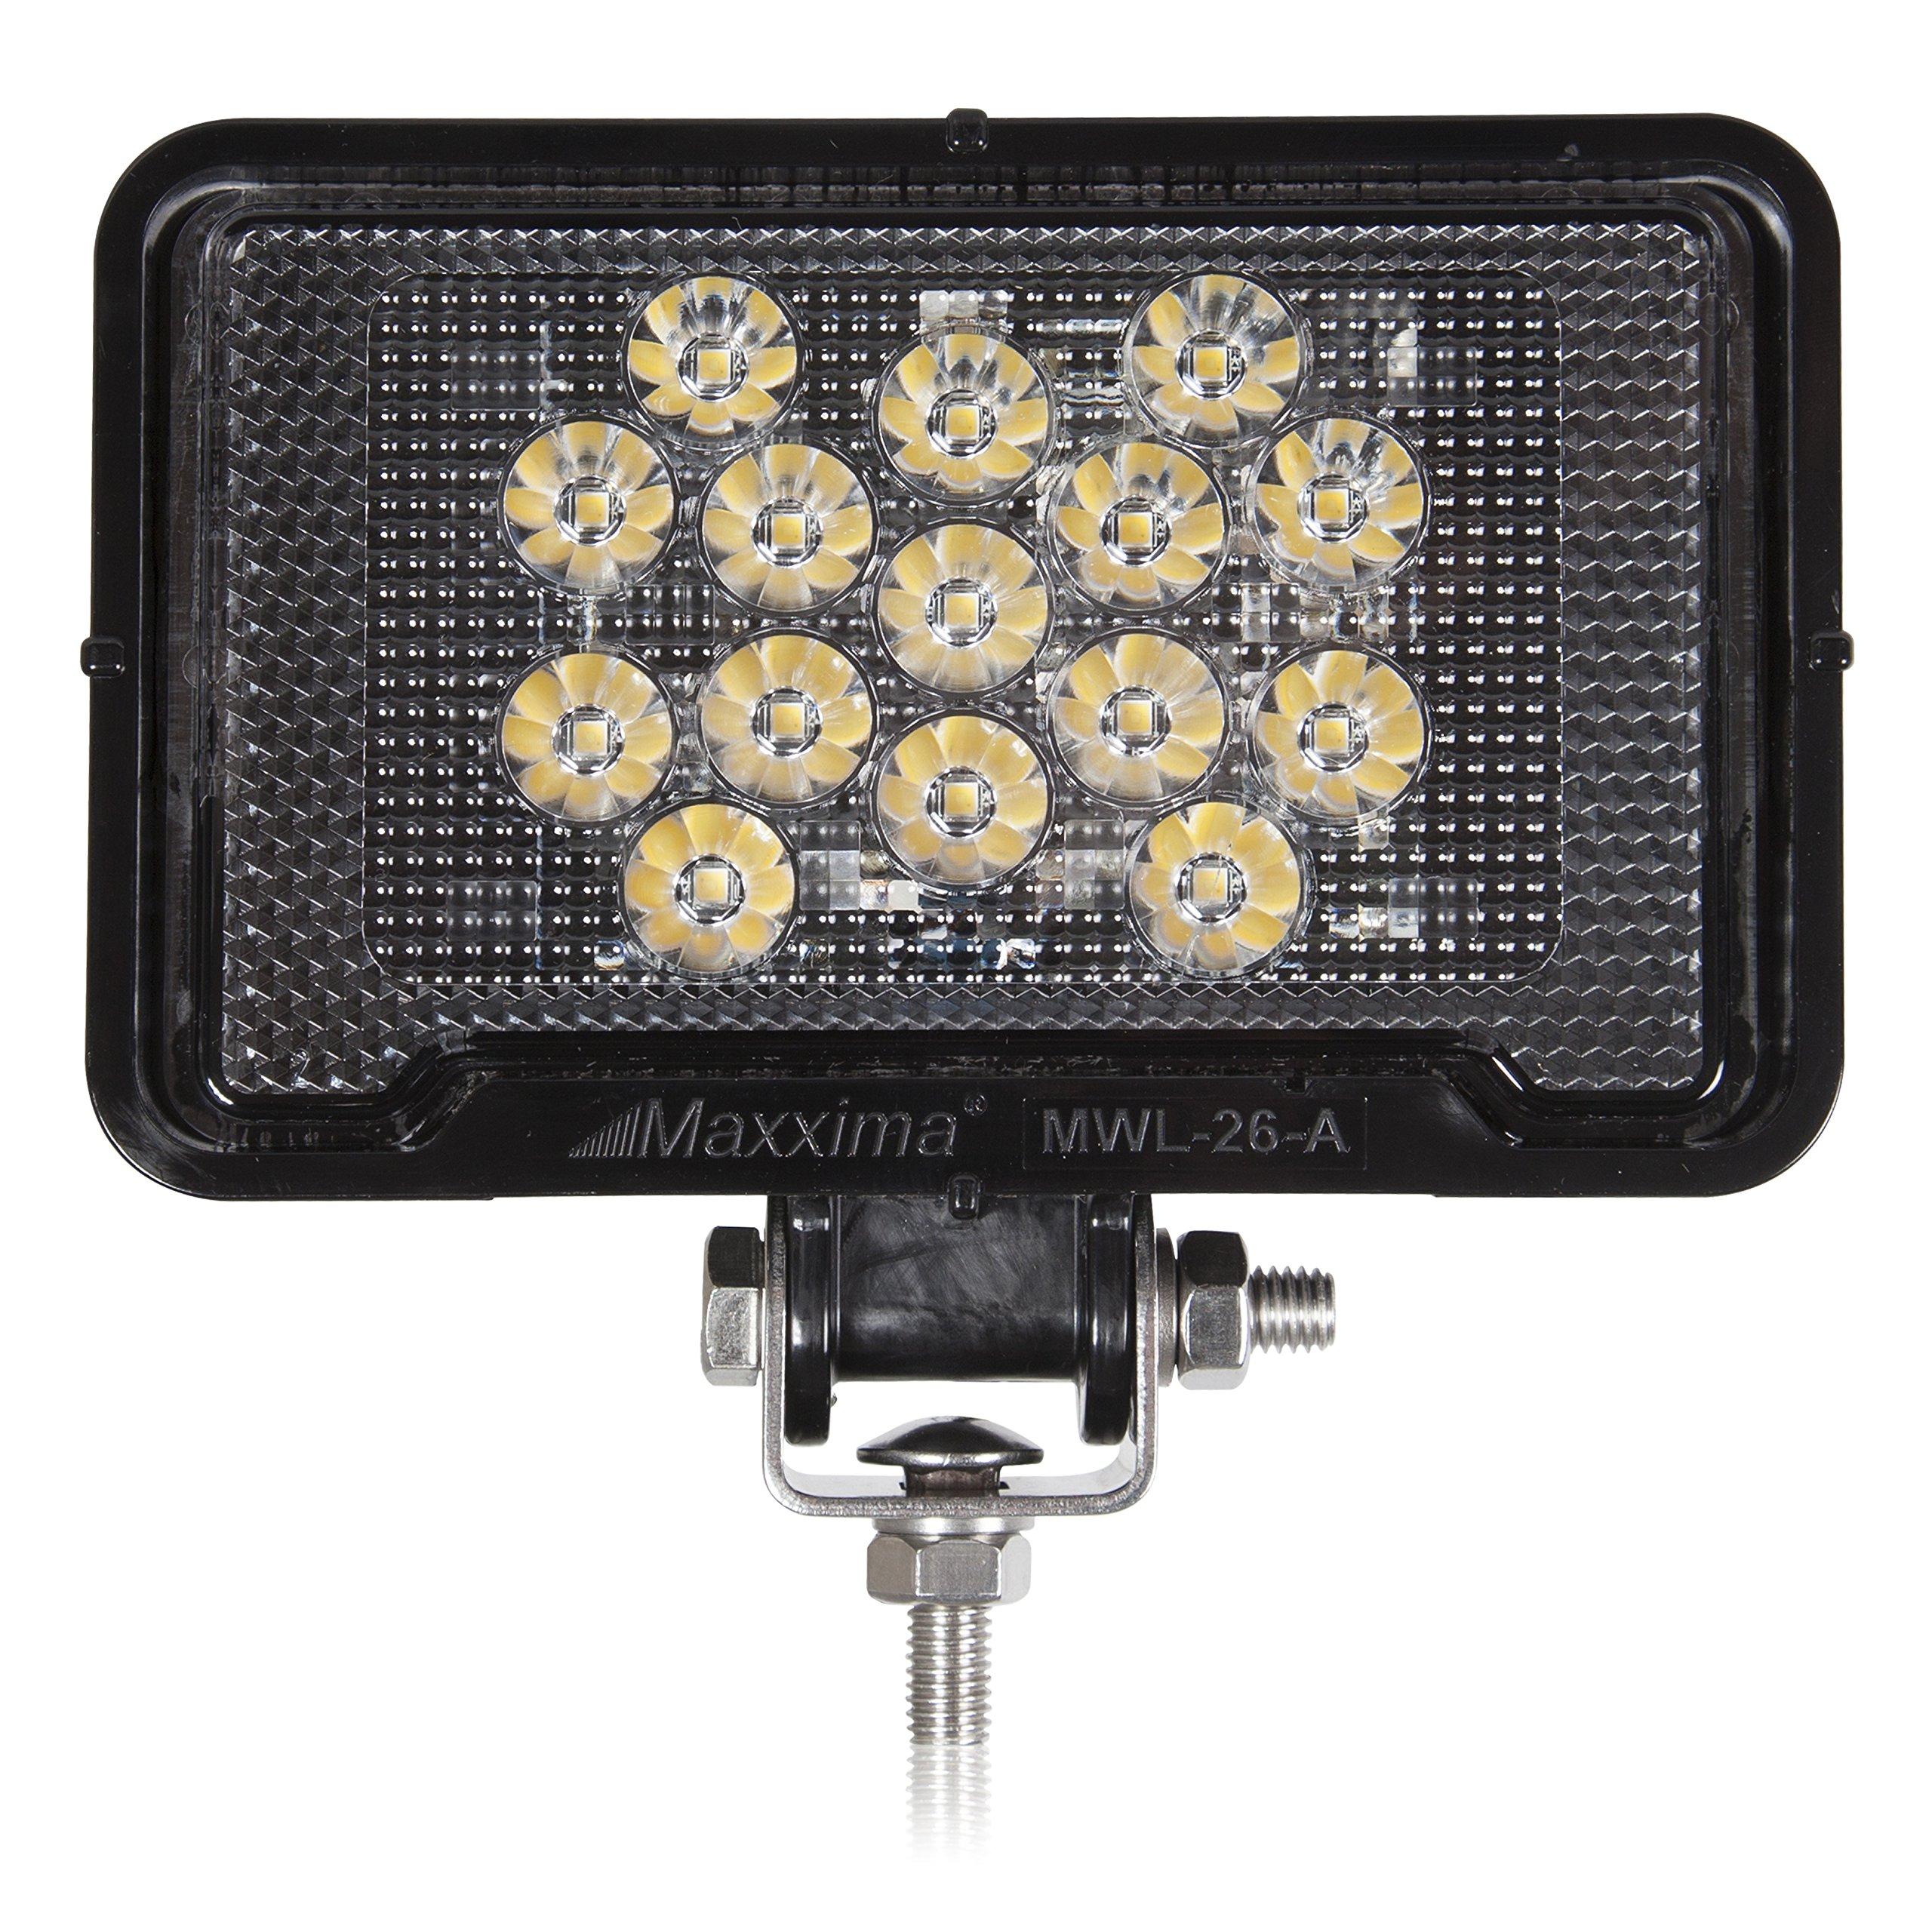 Maxxima MWL-26-A Black Rectangular 15 LED Work Light 550 Lumens by Maxxima